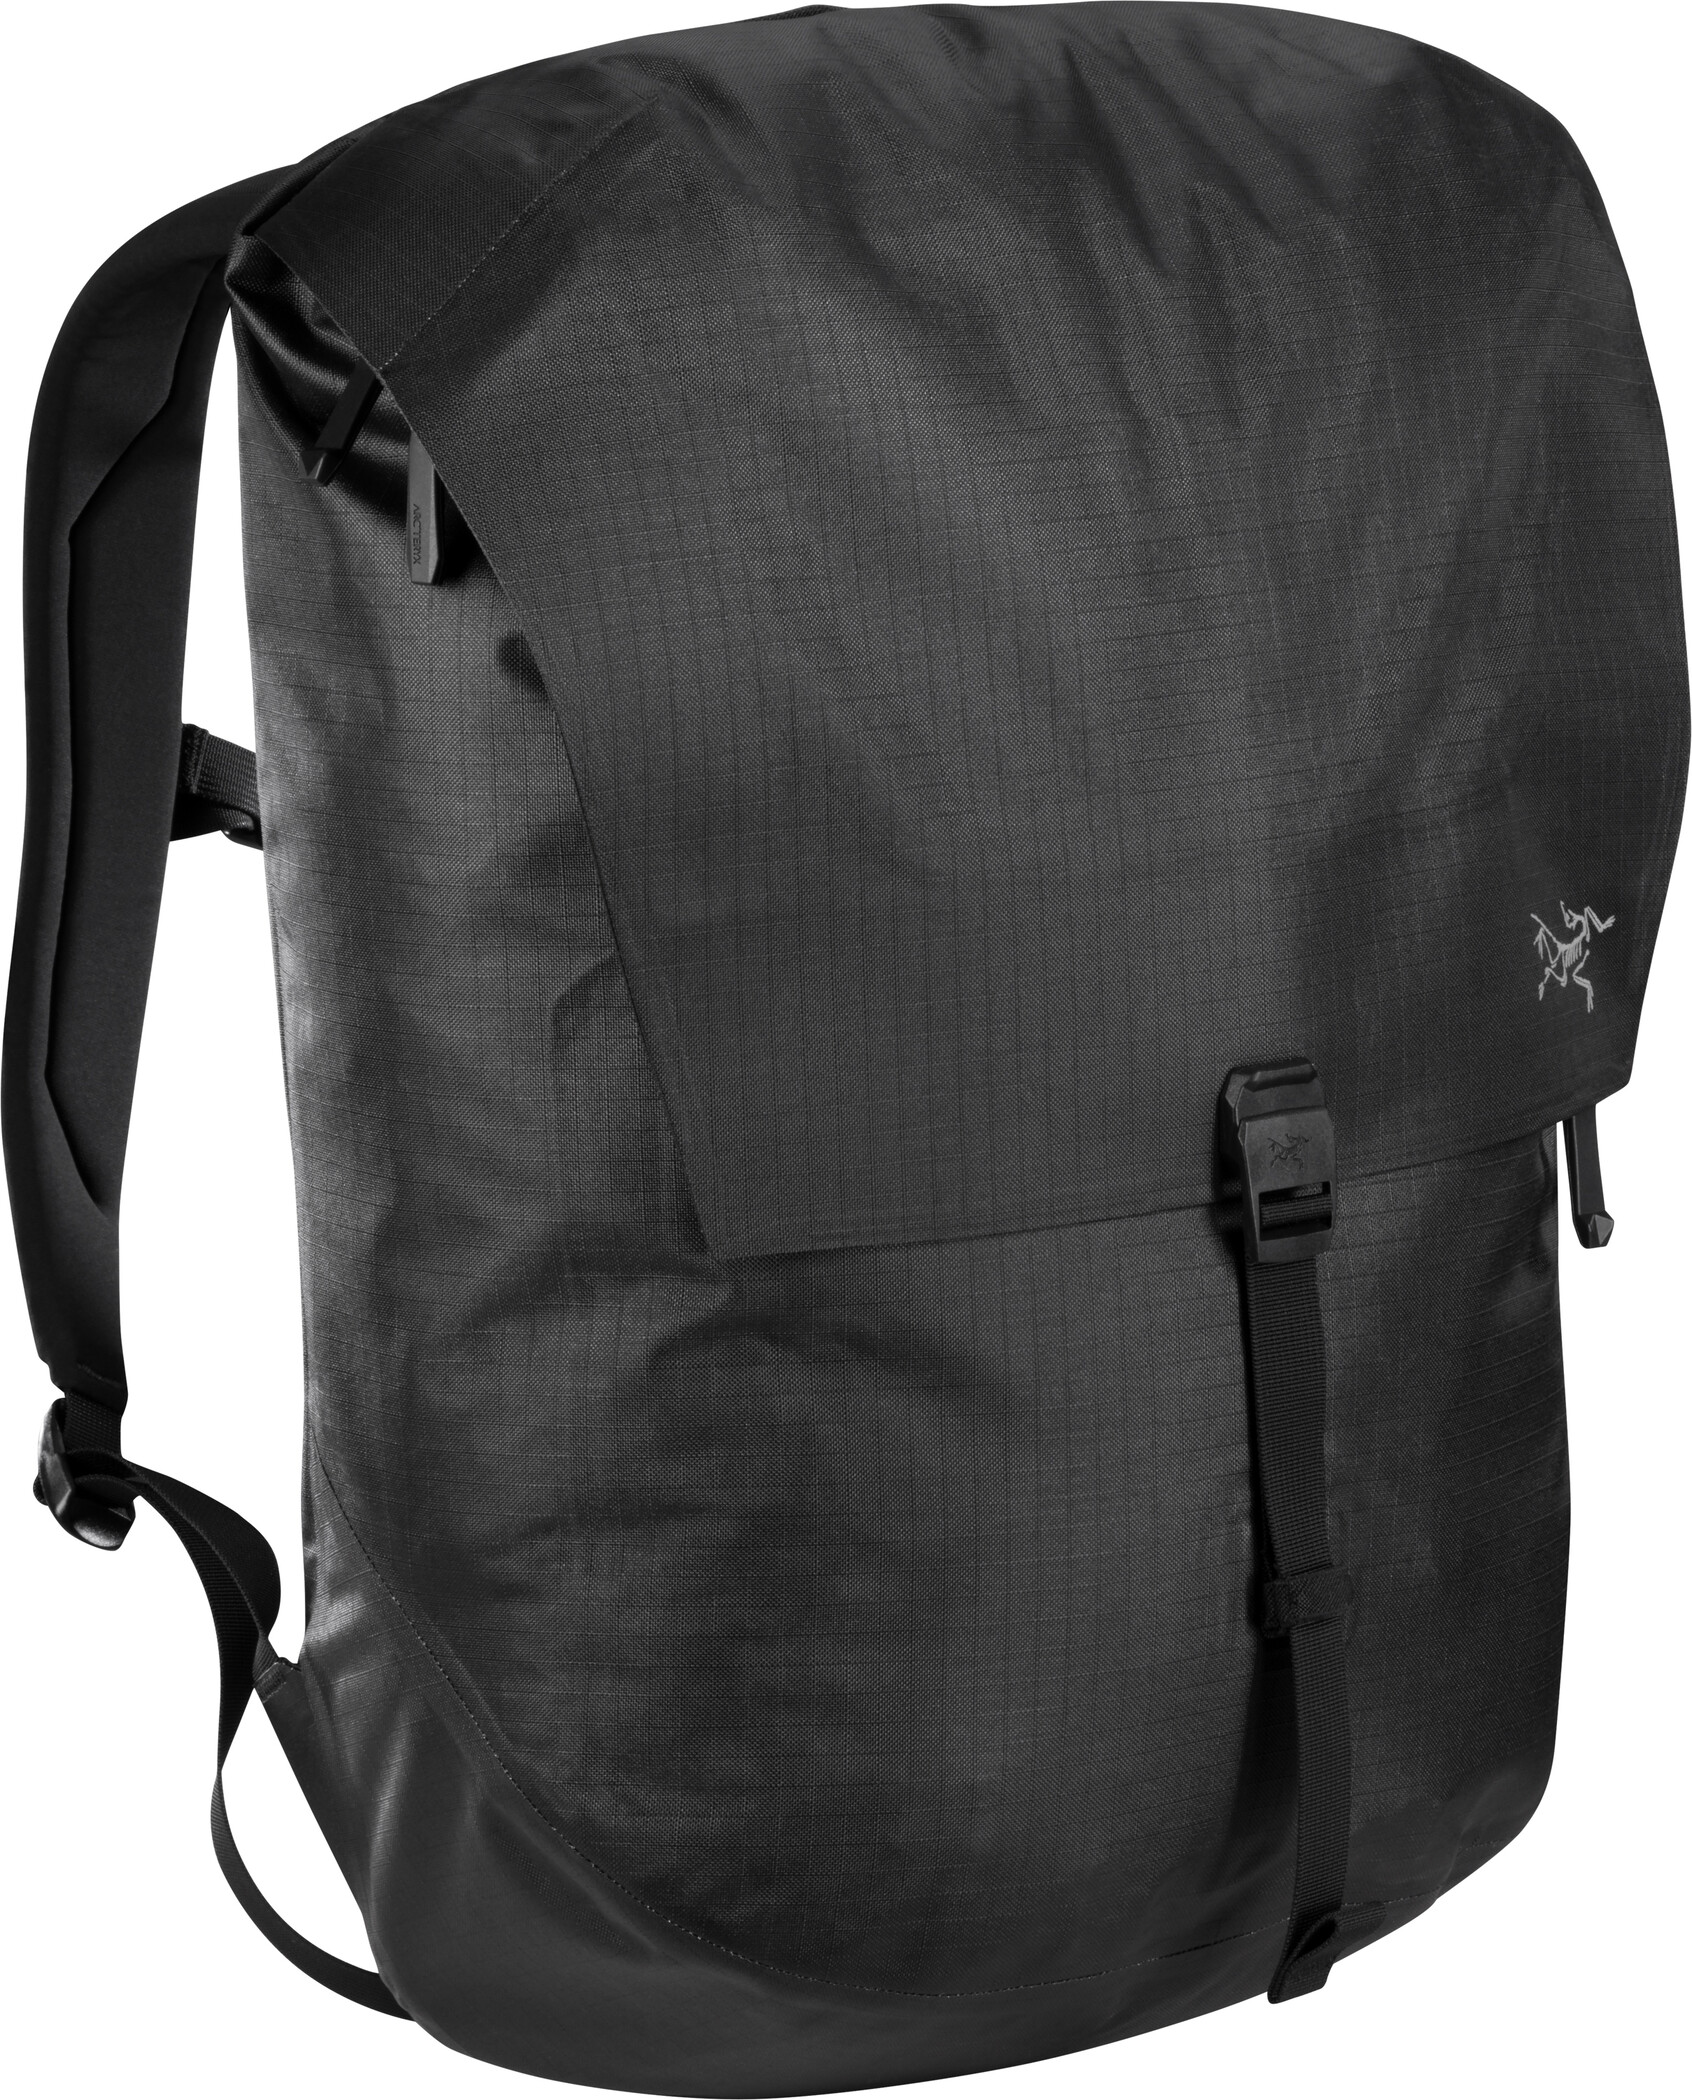 Arc'teryx Granville 20 Rygsæk, black (2019)   Travel bags